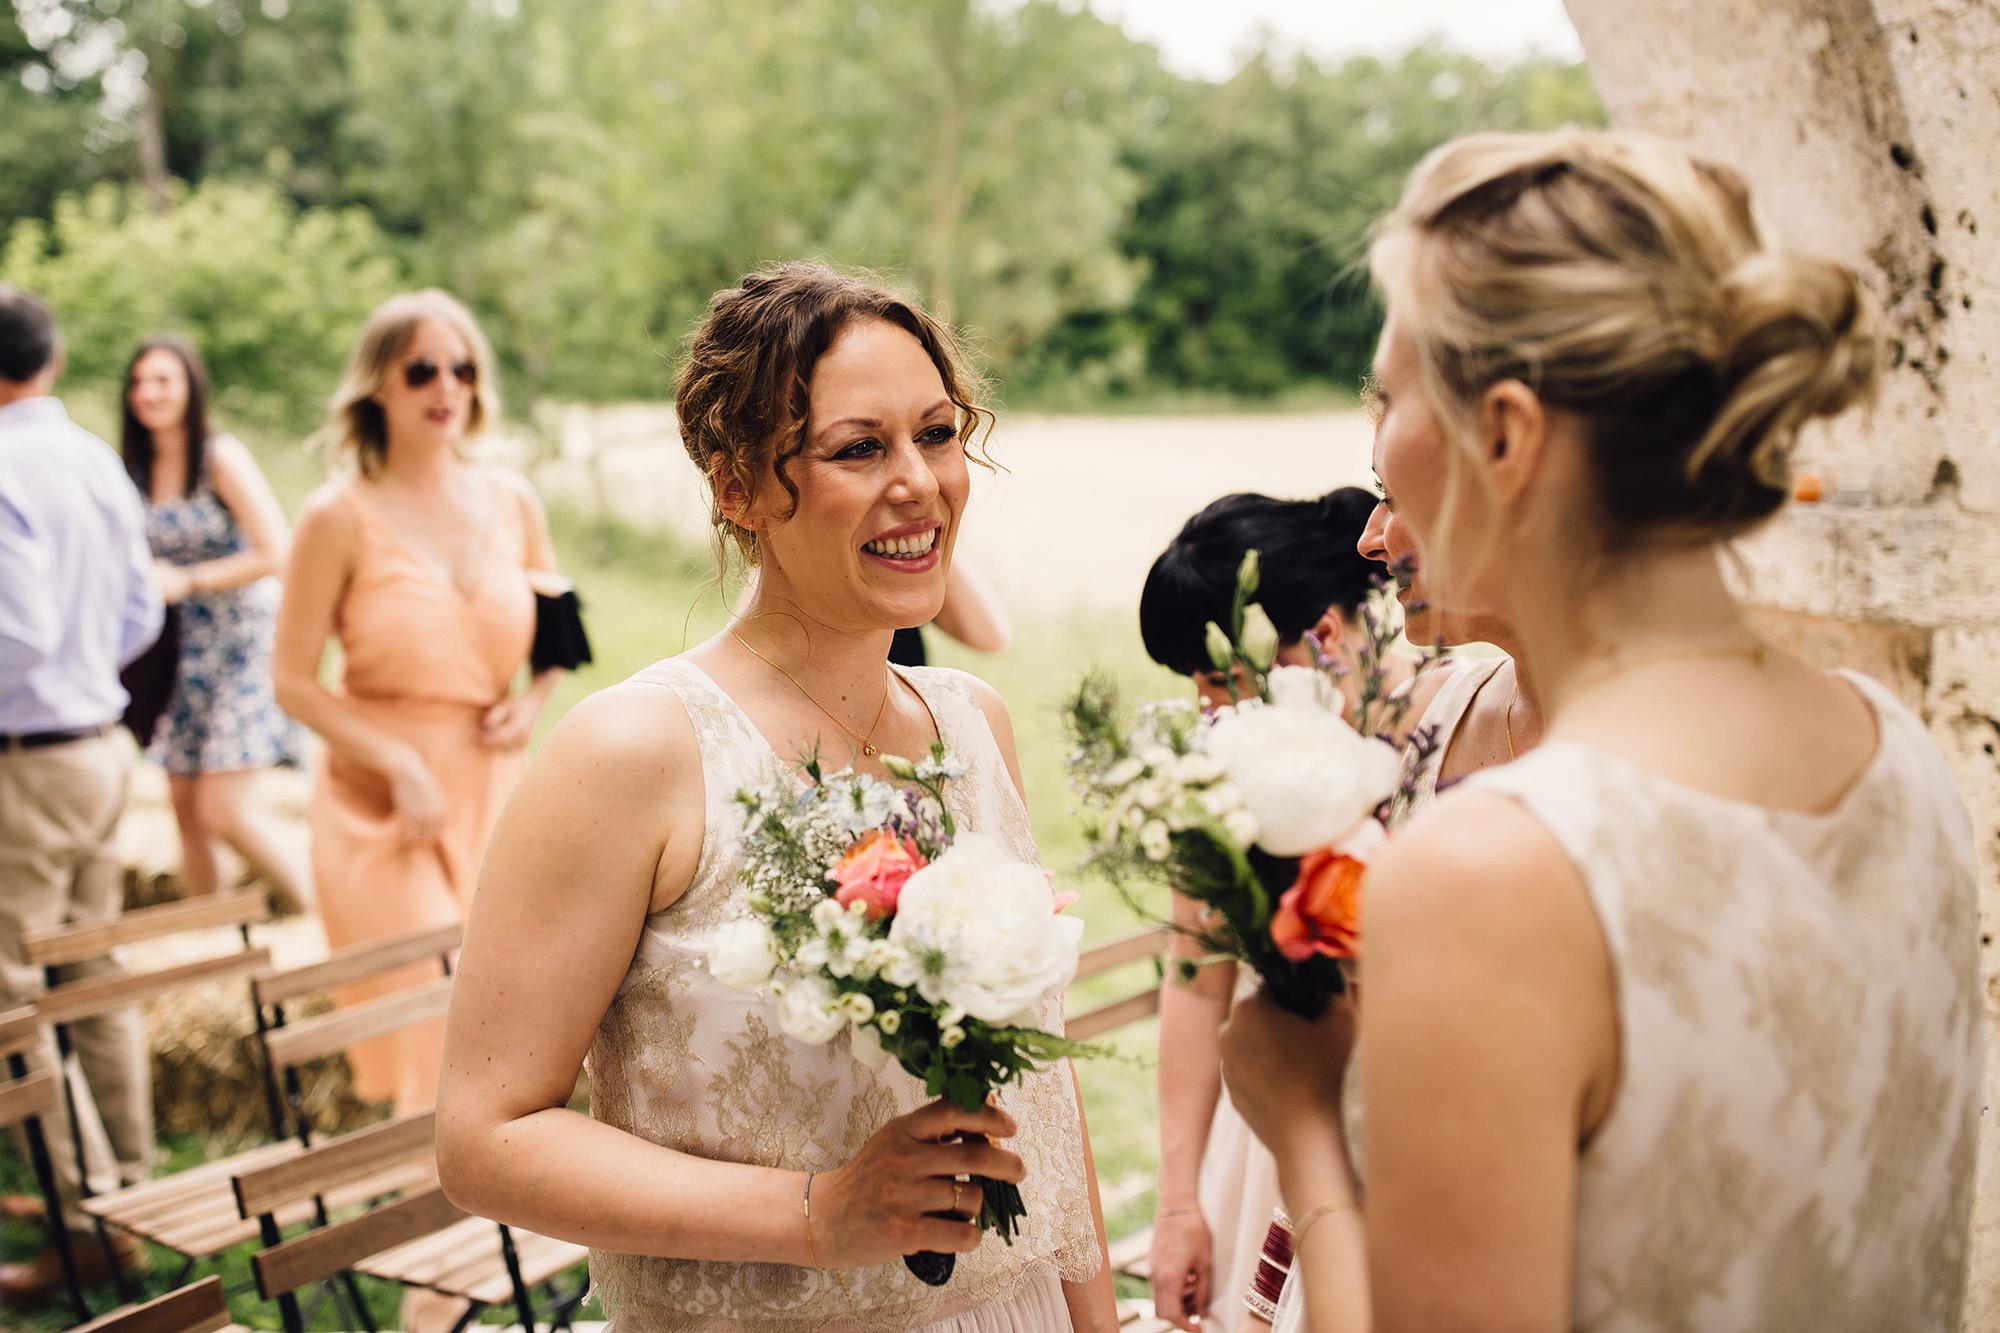 Hannah-Bespoke-Bridesmaids-Bohemian-French-Wedding-Gold-Lace-Susanna-Greening-Designs-Matlock-Derbyshire-14